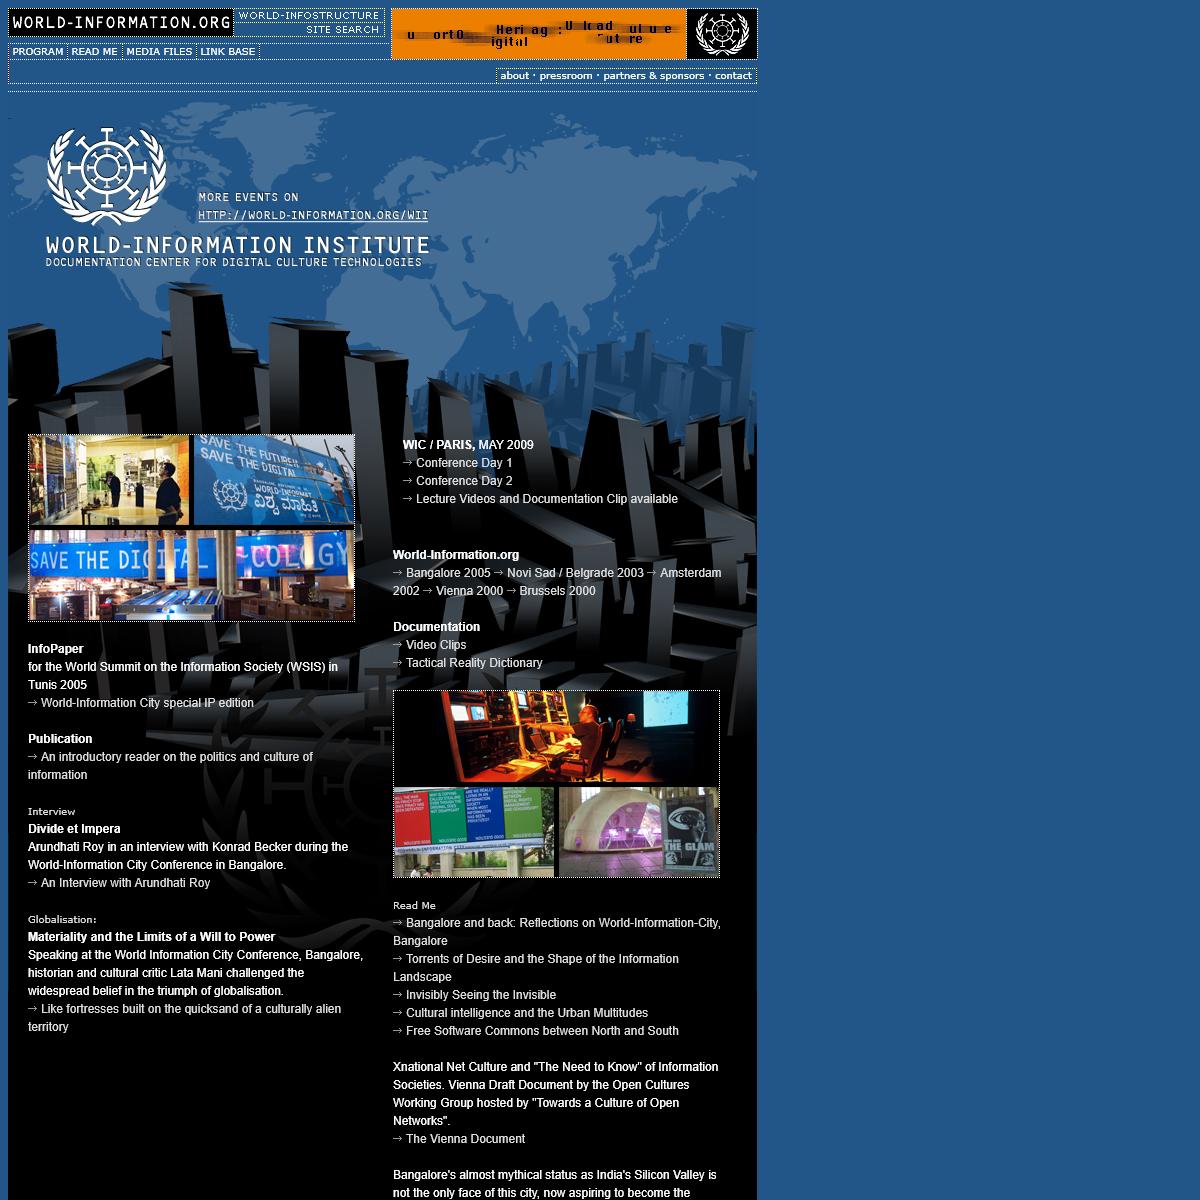 World-Information.Org